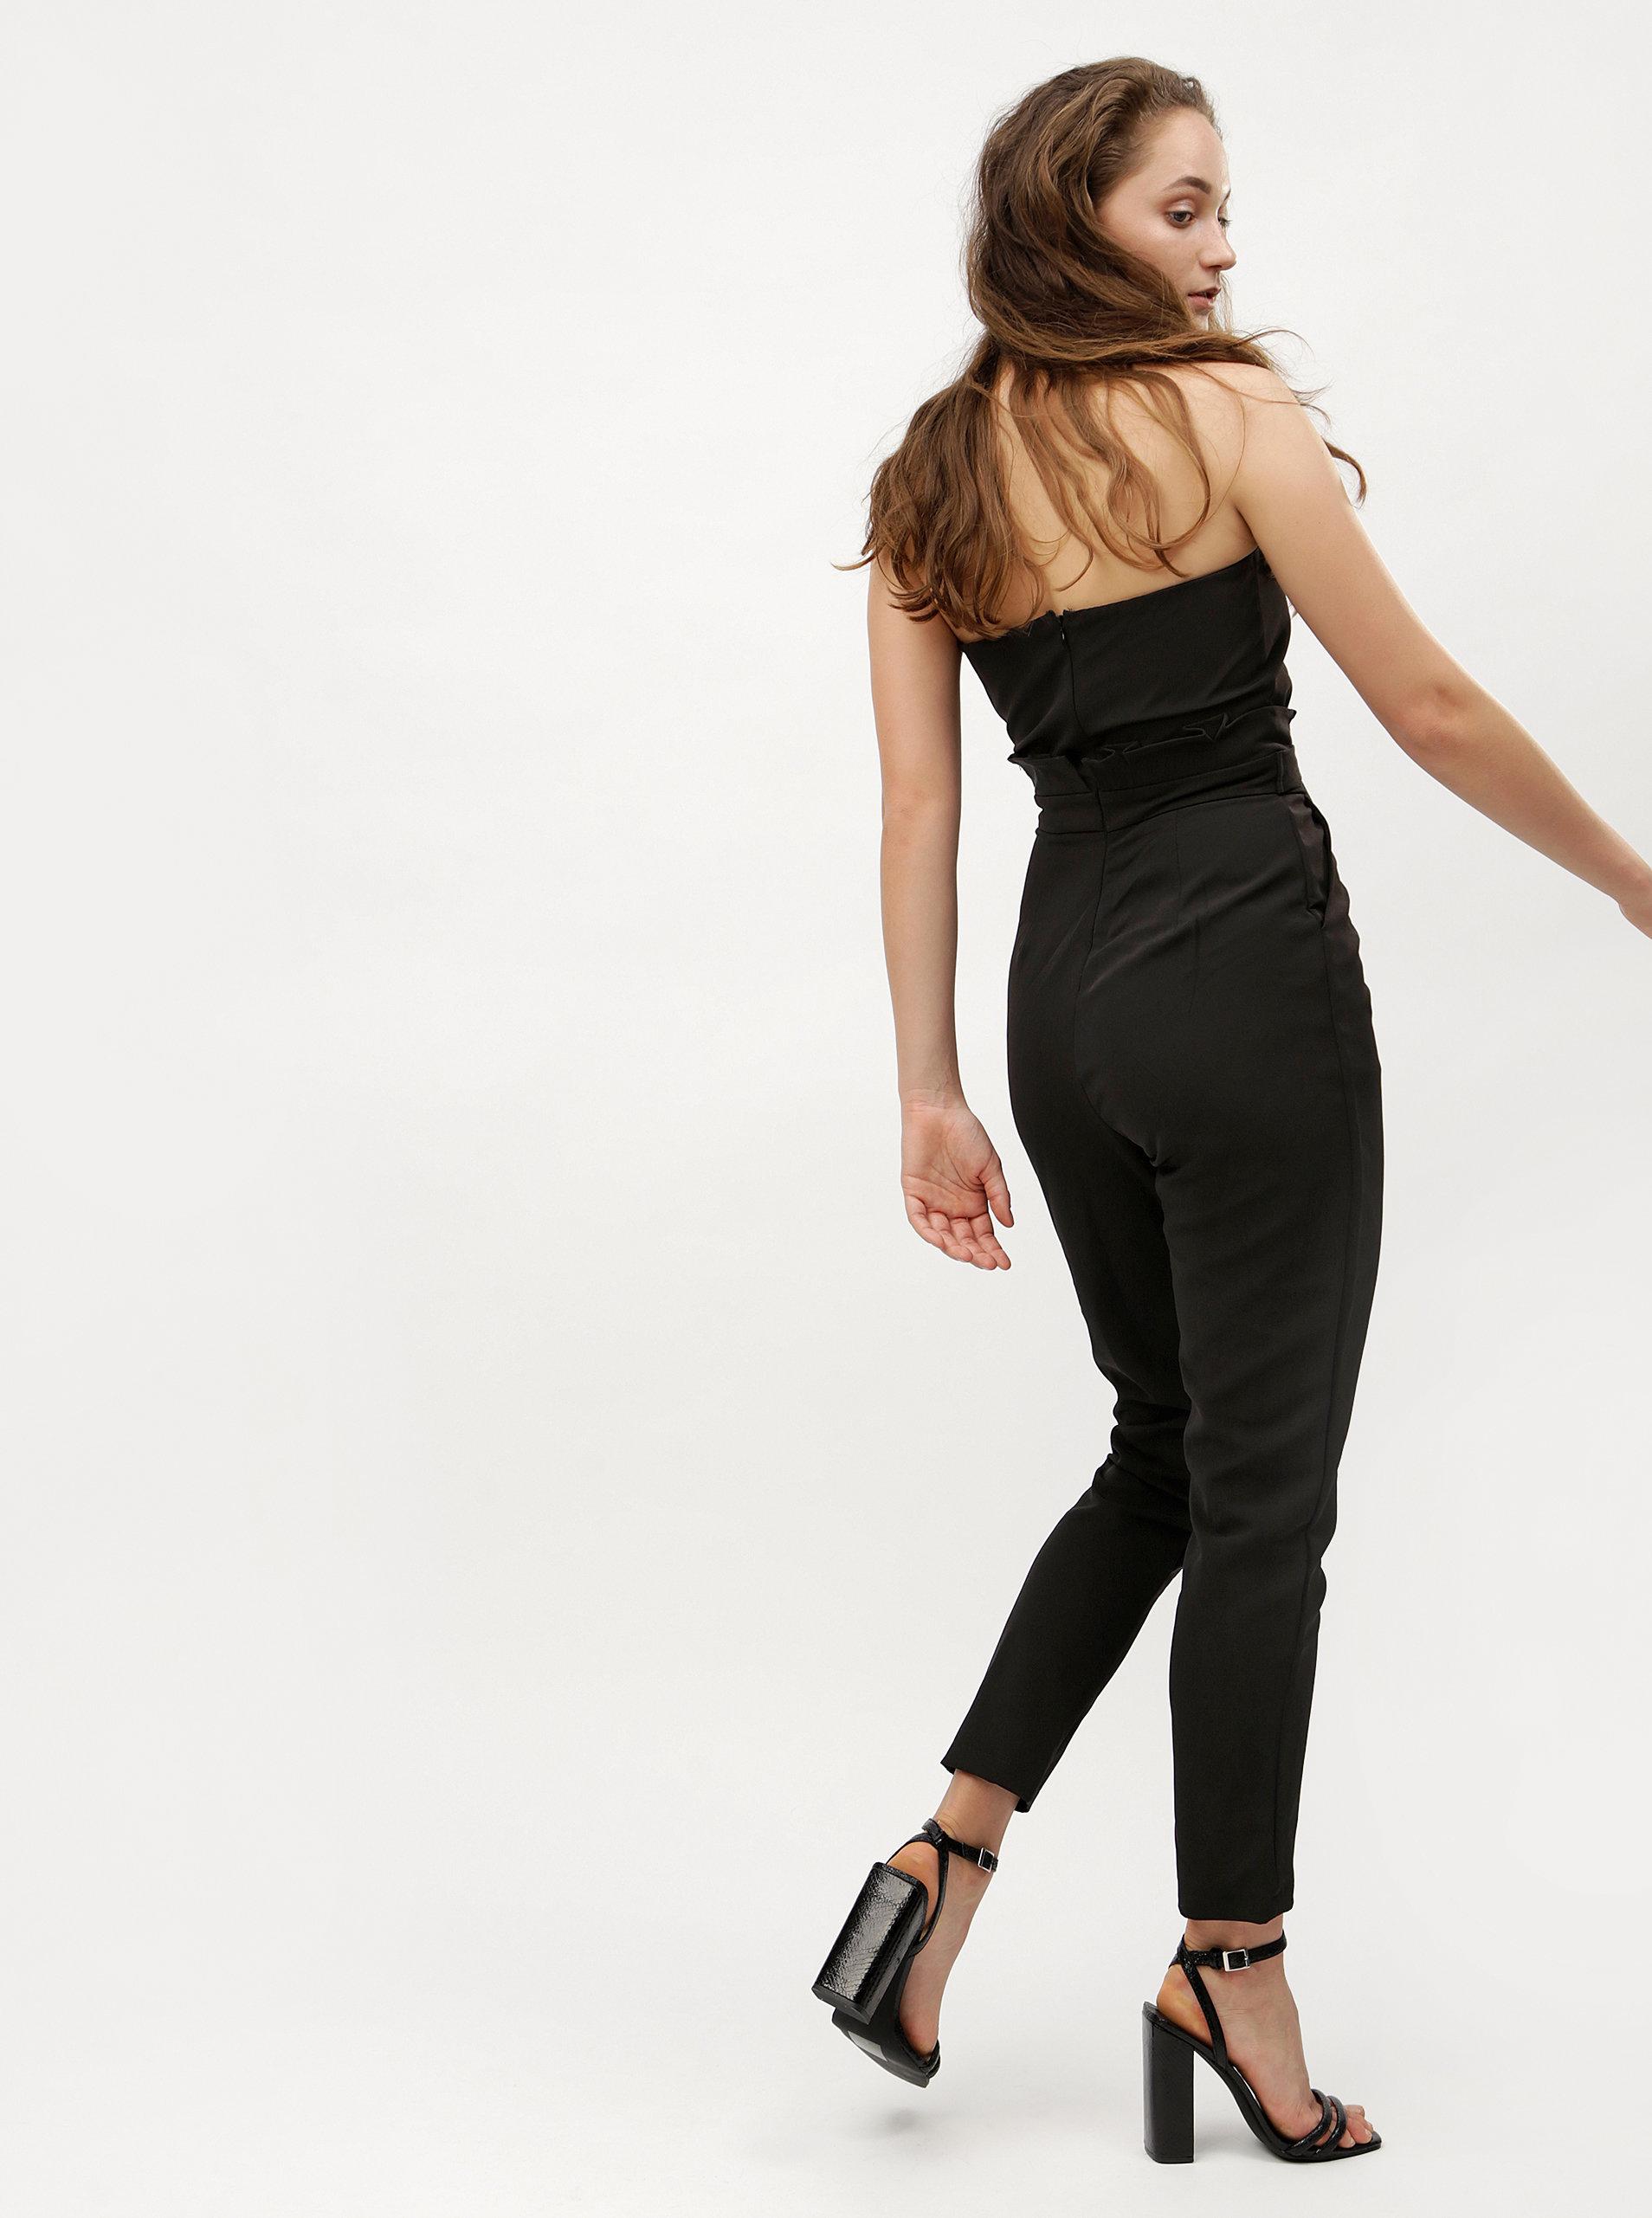 59d7102c3 Čierny overal s odhalenými ramenami MISSGUIDED | ZOOT.sk